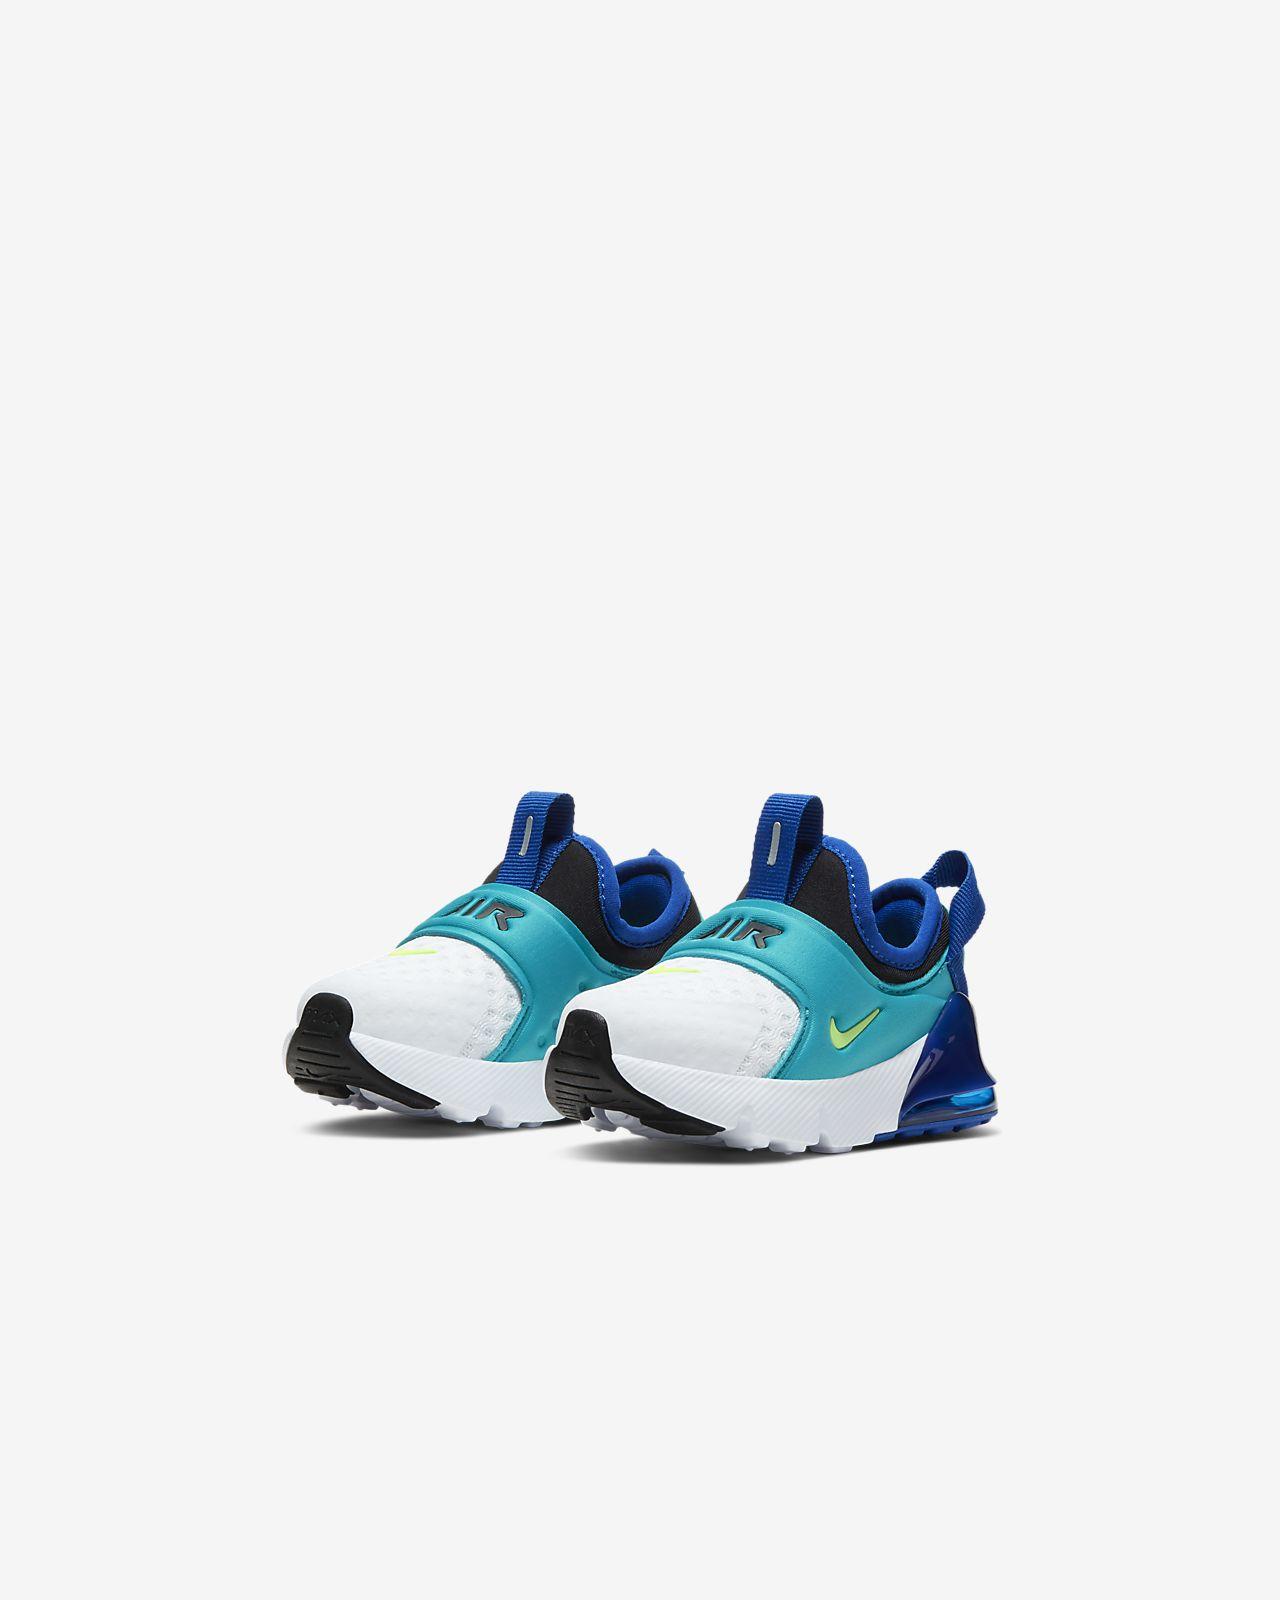 Nike Air Max 270 Extreme Schoen voor baby'speuters